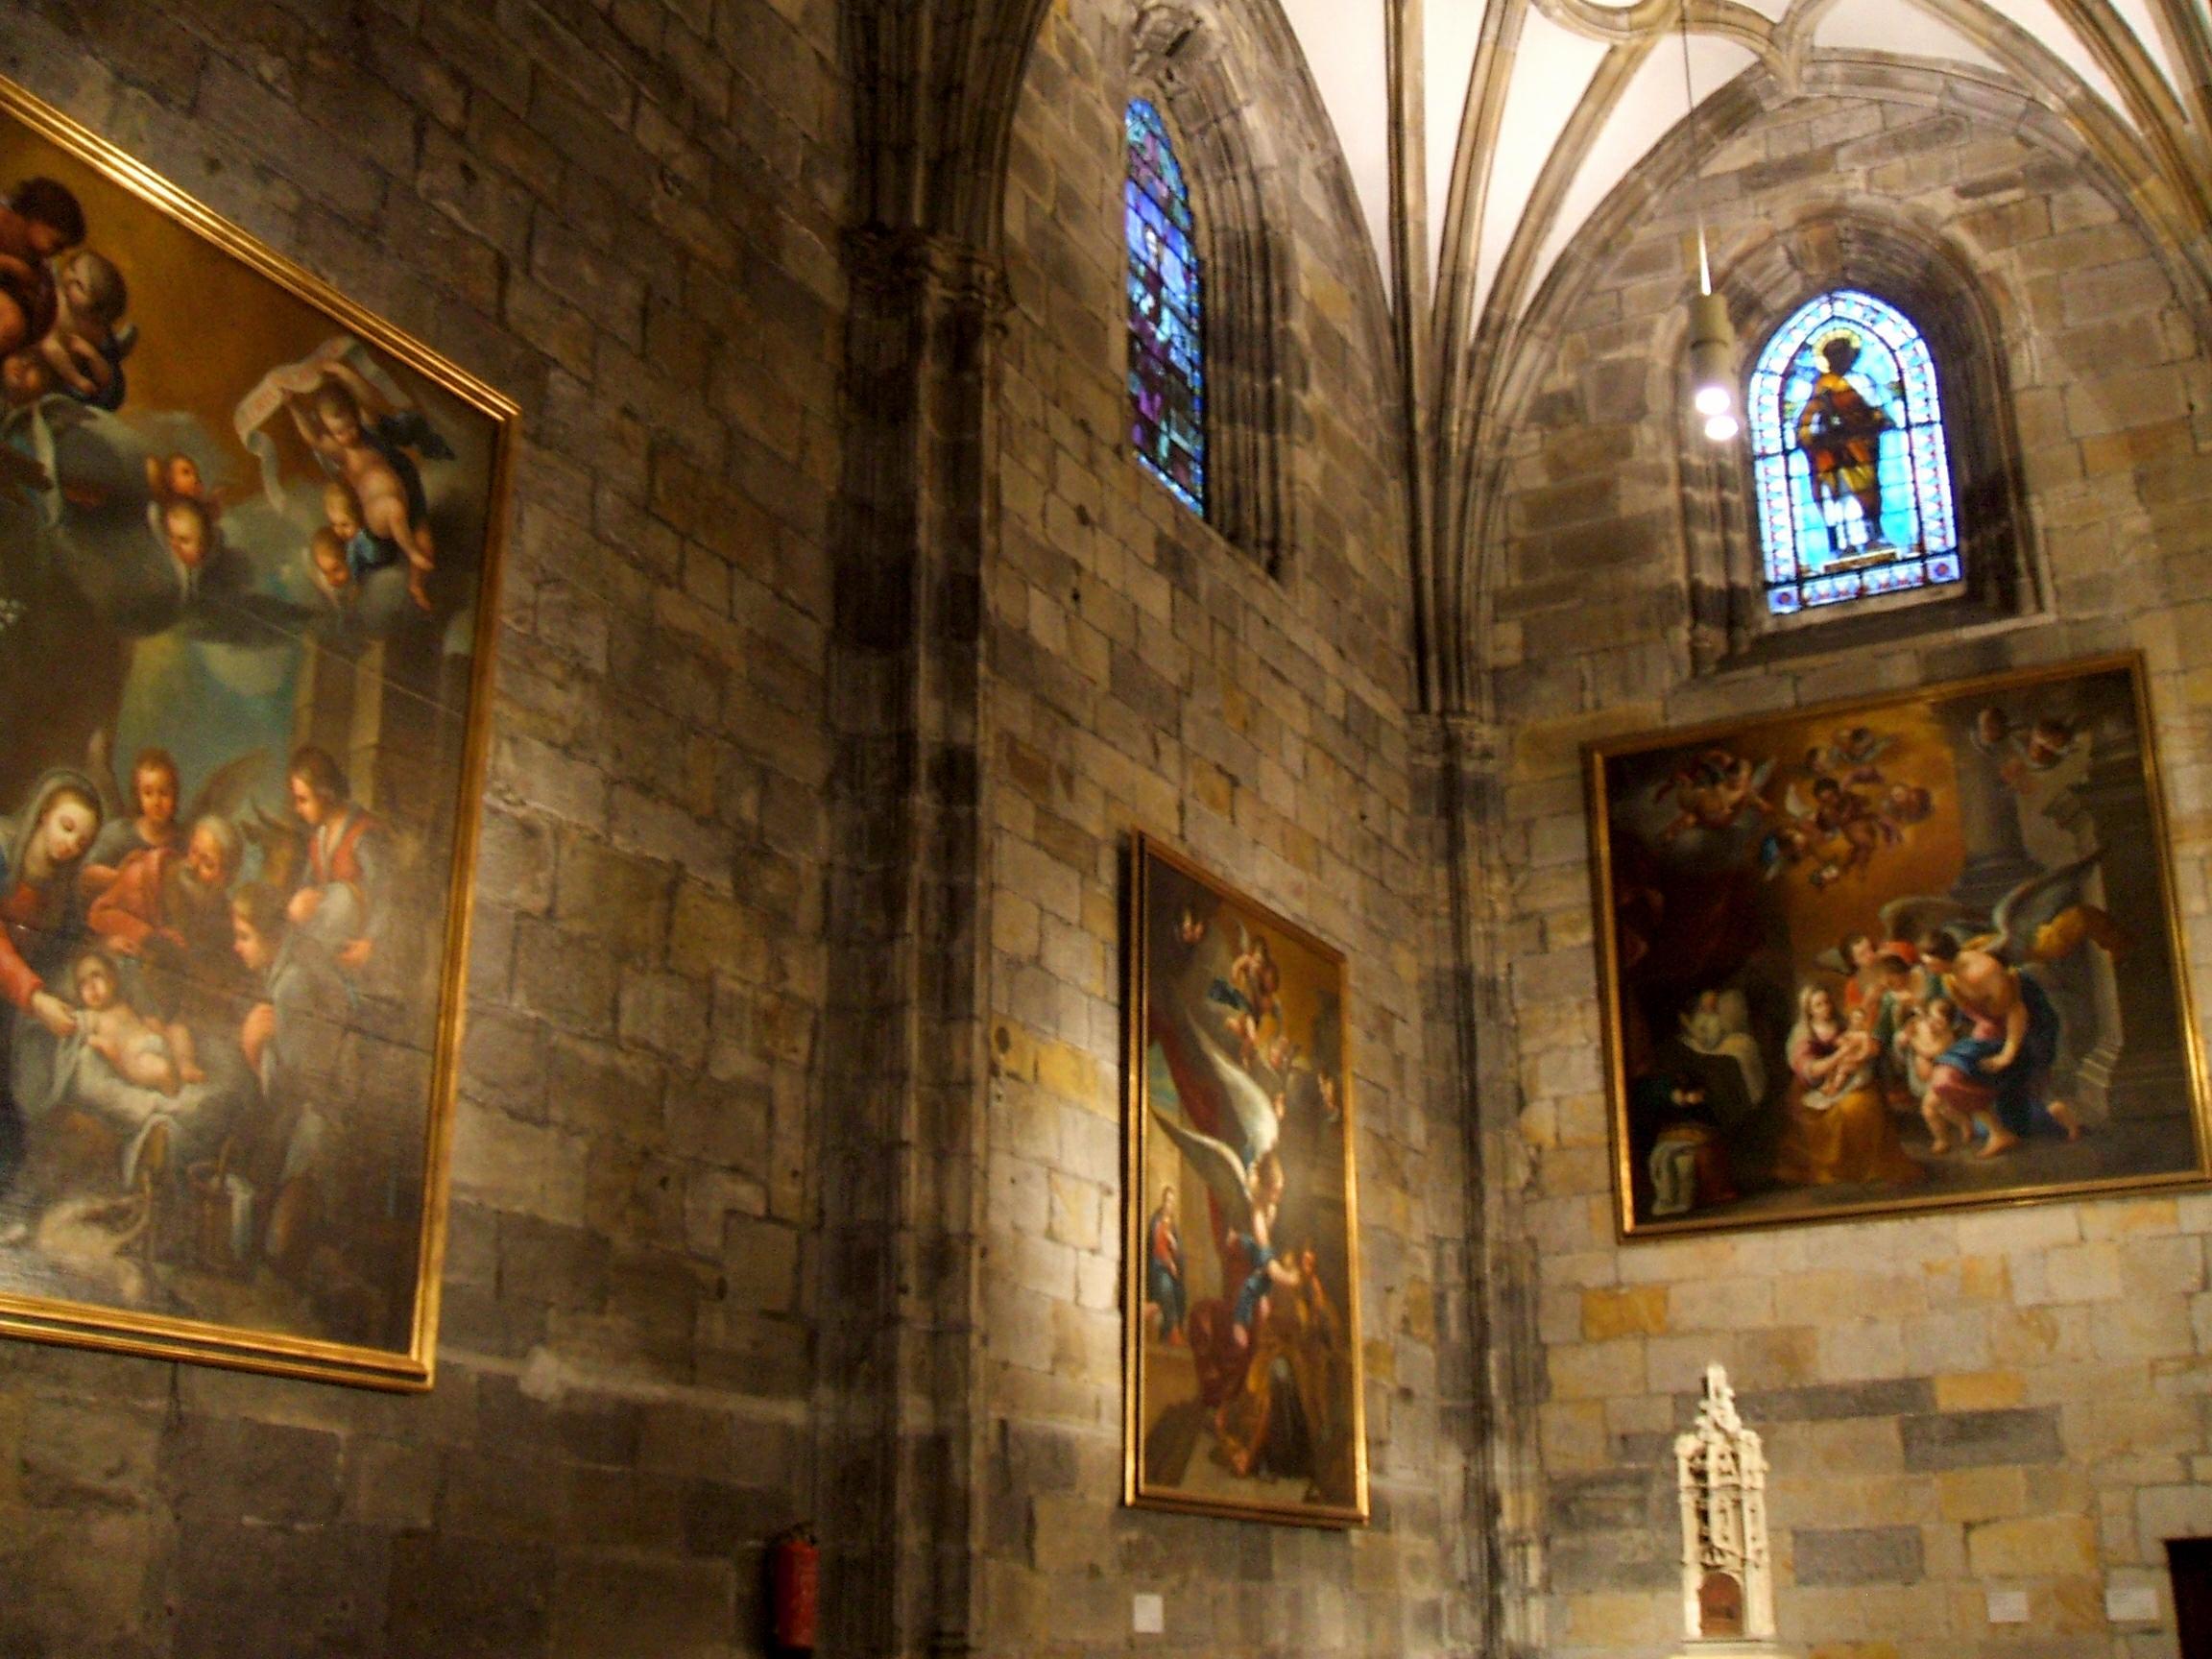 File:Bilbao - Basilica de Begoña 10.JPG - Wikimedia Commons